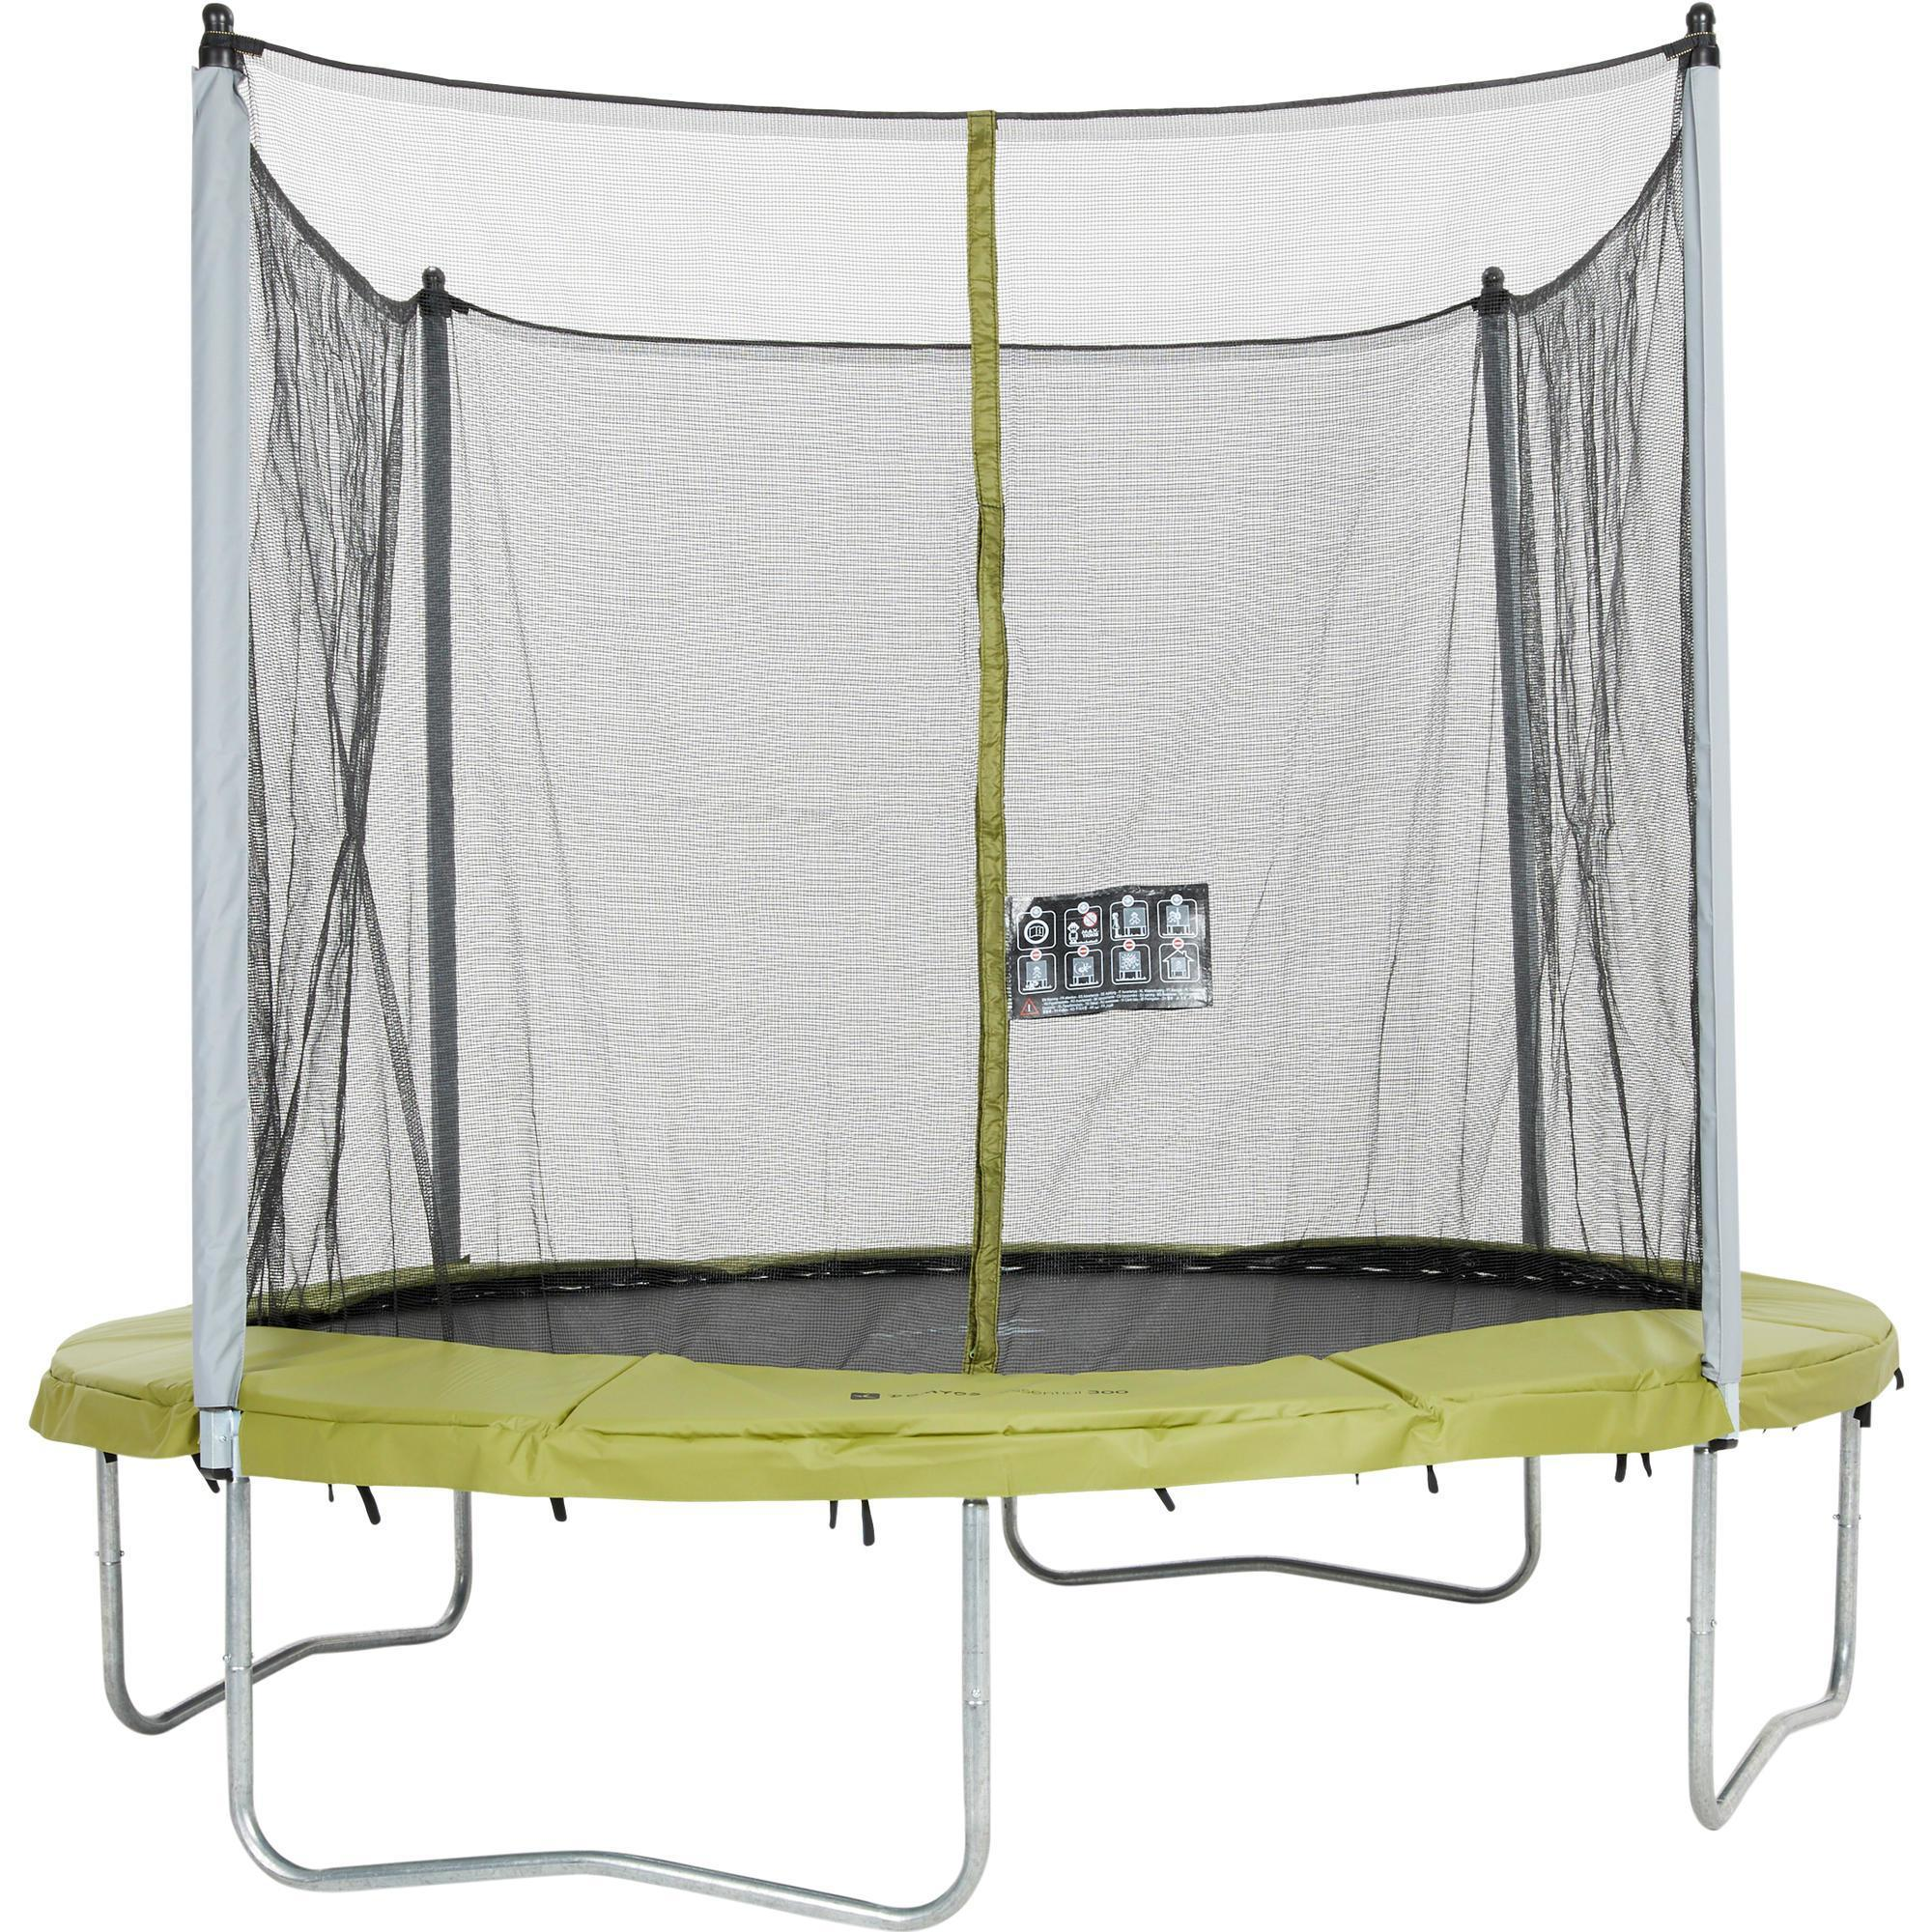 Domyos Trampoline Essential 300, springvlak 260cm